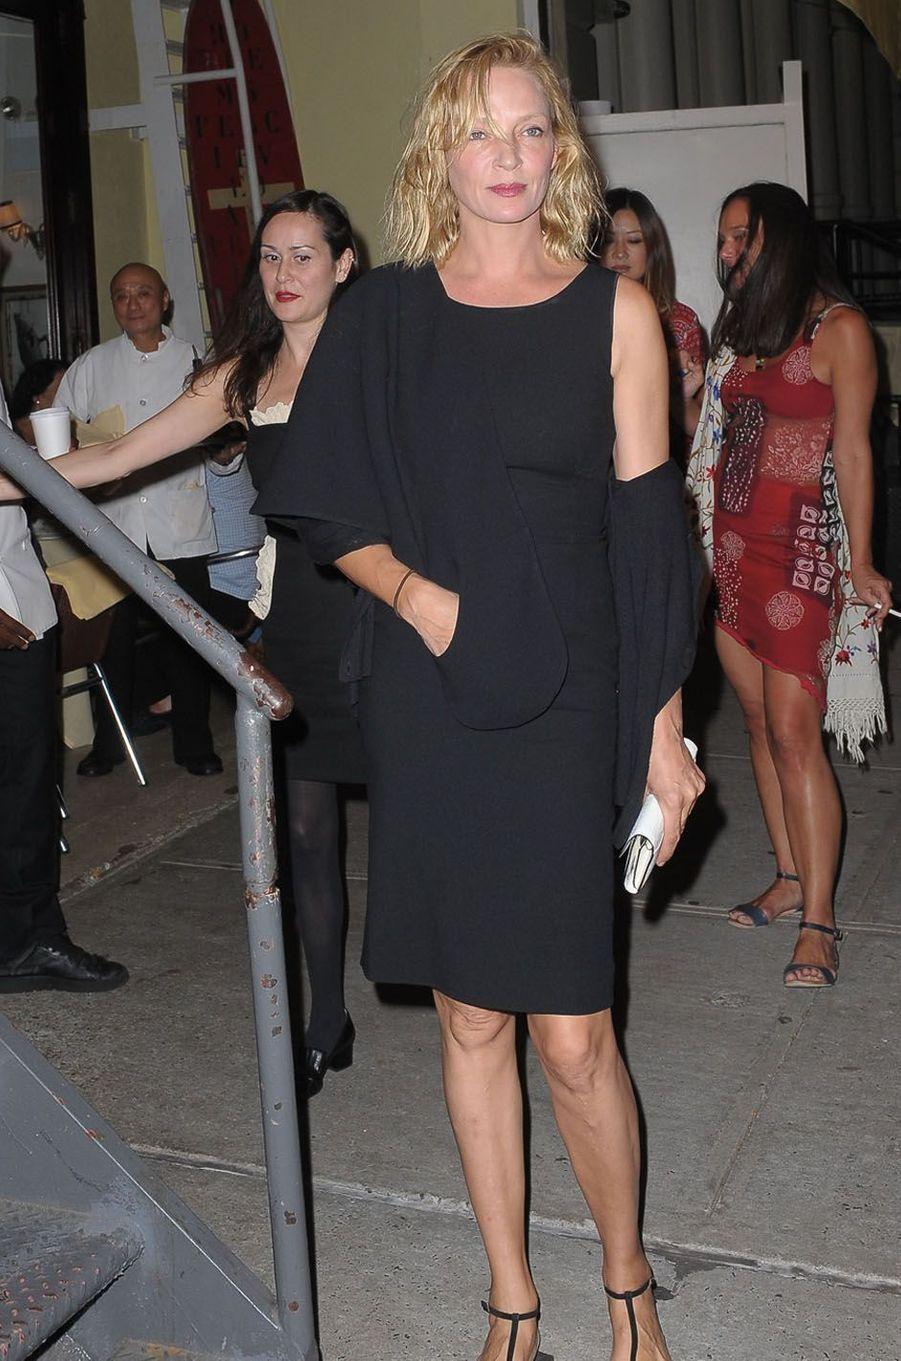 Uma Thurmanlors de la fête de fiançailles de Quentin Tarantino et Daniella Pick, le 23 septembre 2017 à New York.